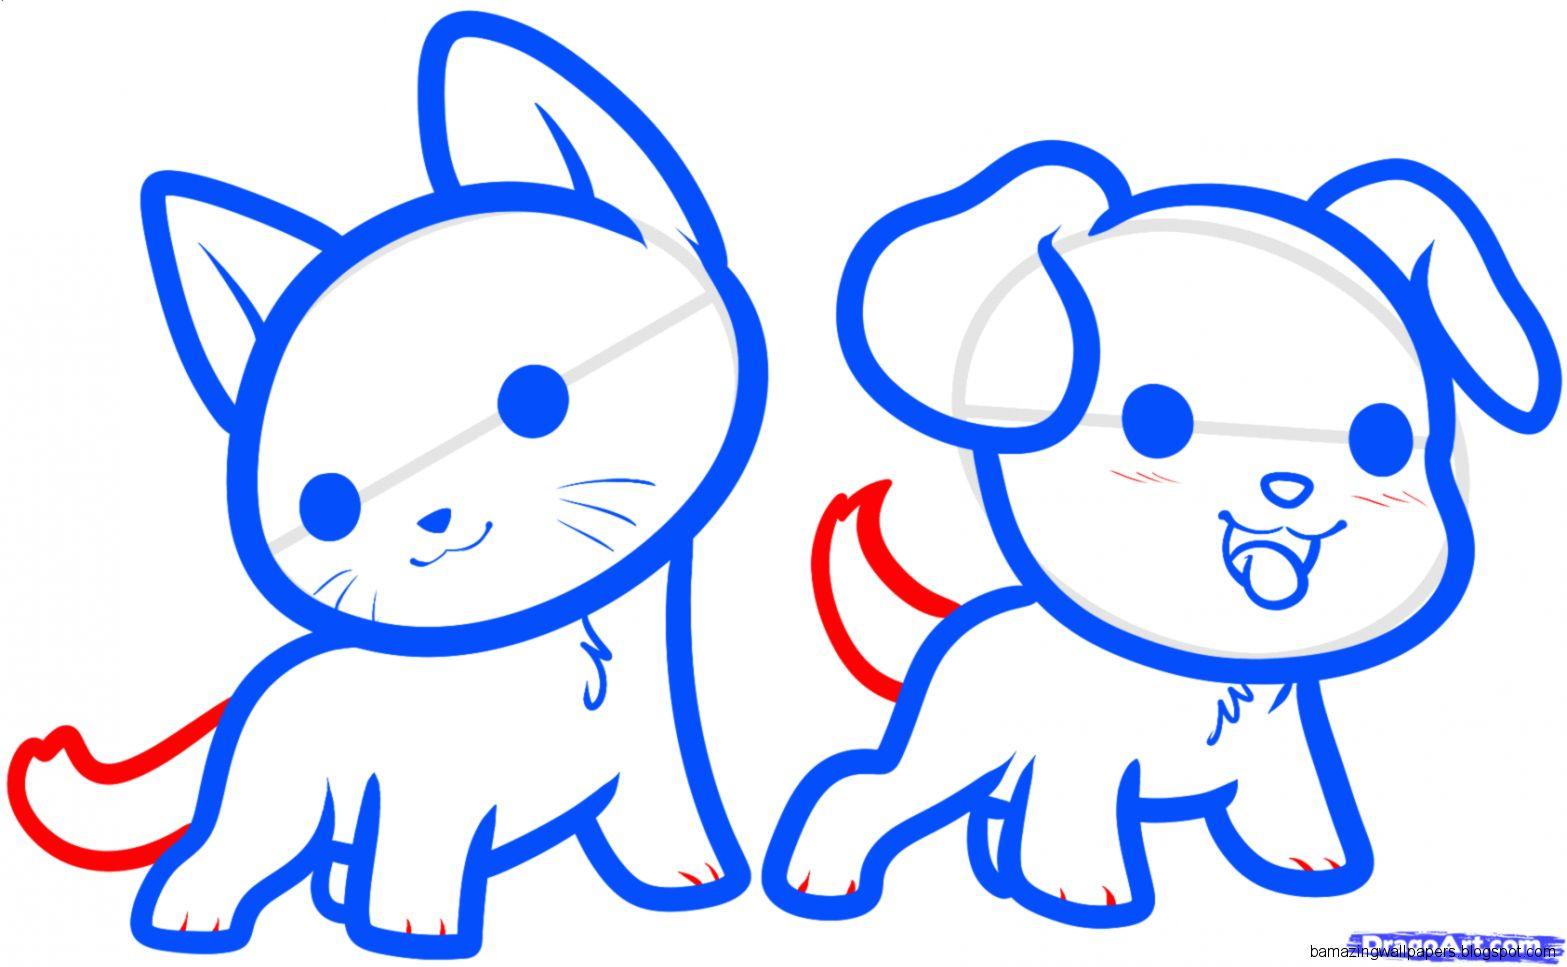 Drawing Tutorial Doodledrawcute #howtodraw # Easy And Cute Dog Drawings ,  Cute Dog Drawing Step By Step Showing Post & Media